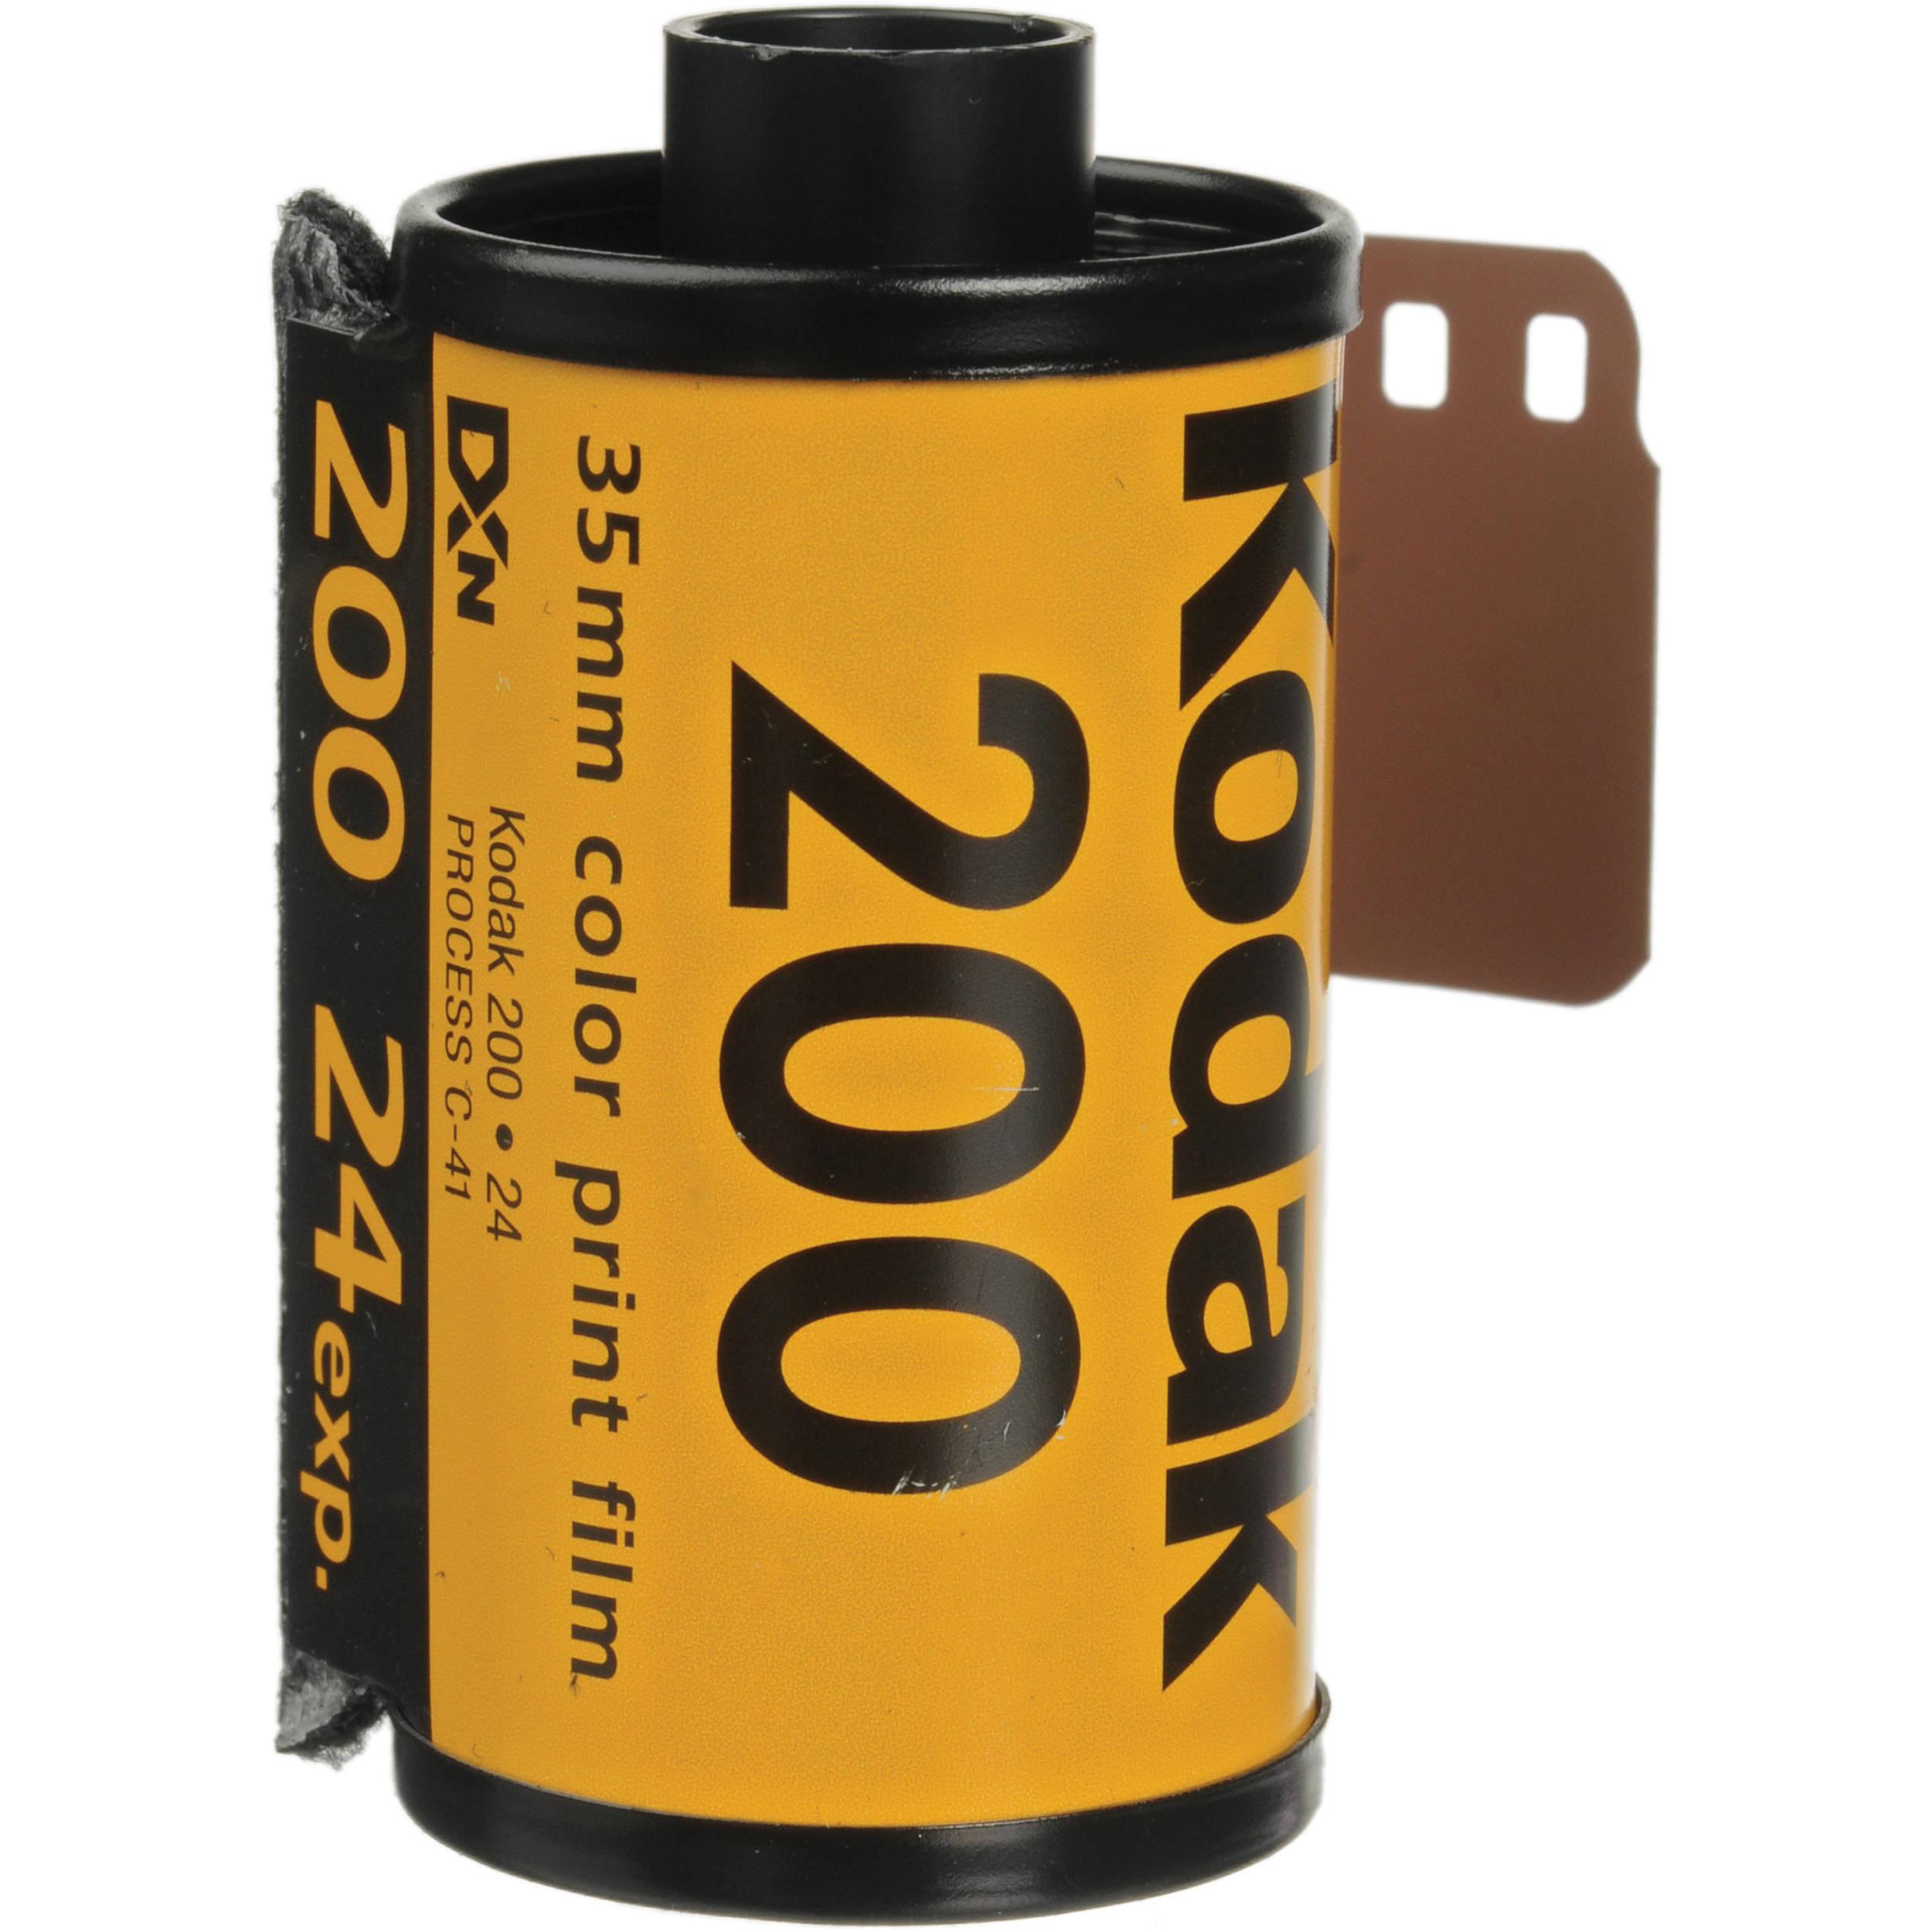 Kodak Gold 200 Color Negative Film 6033955 B Amp H Photo Video